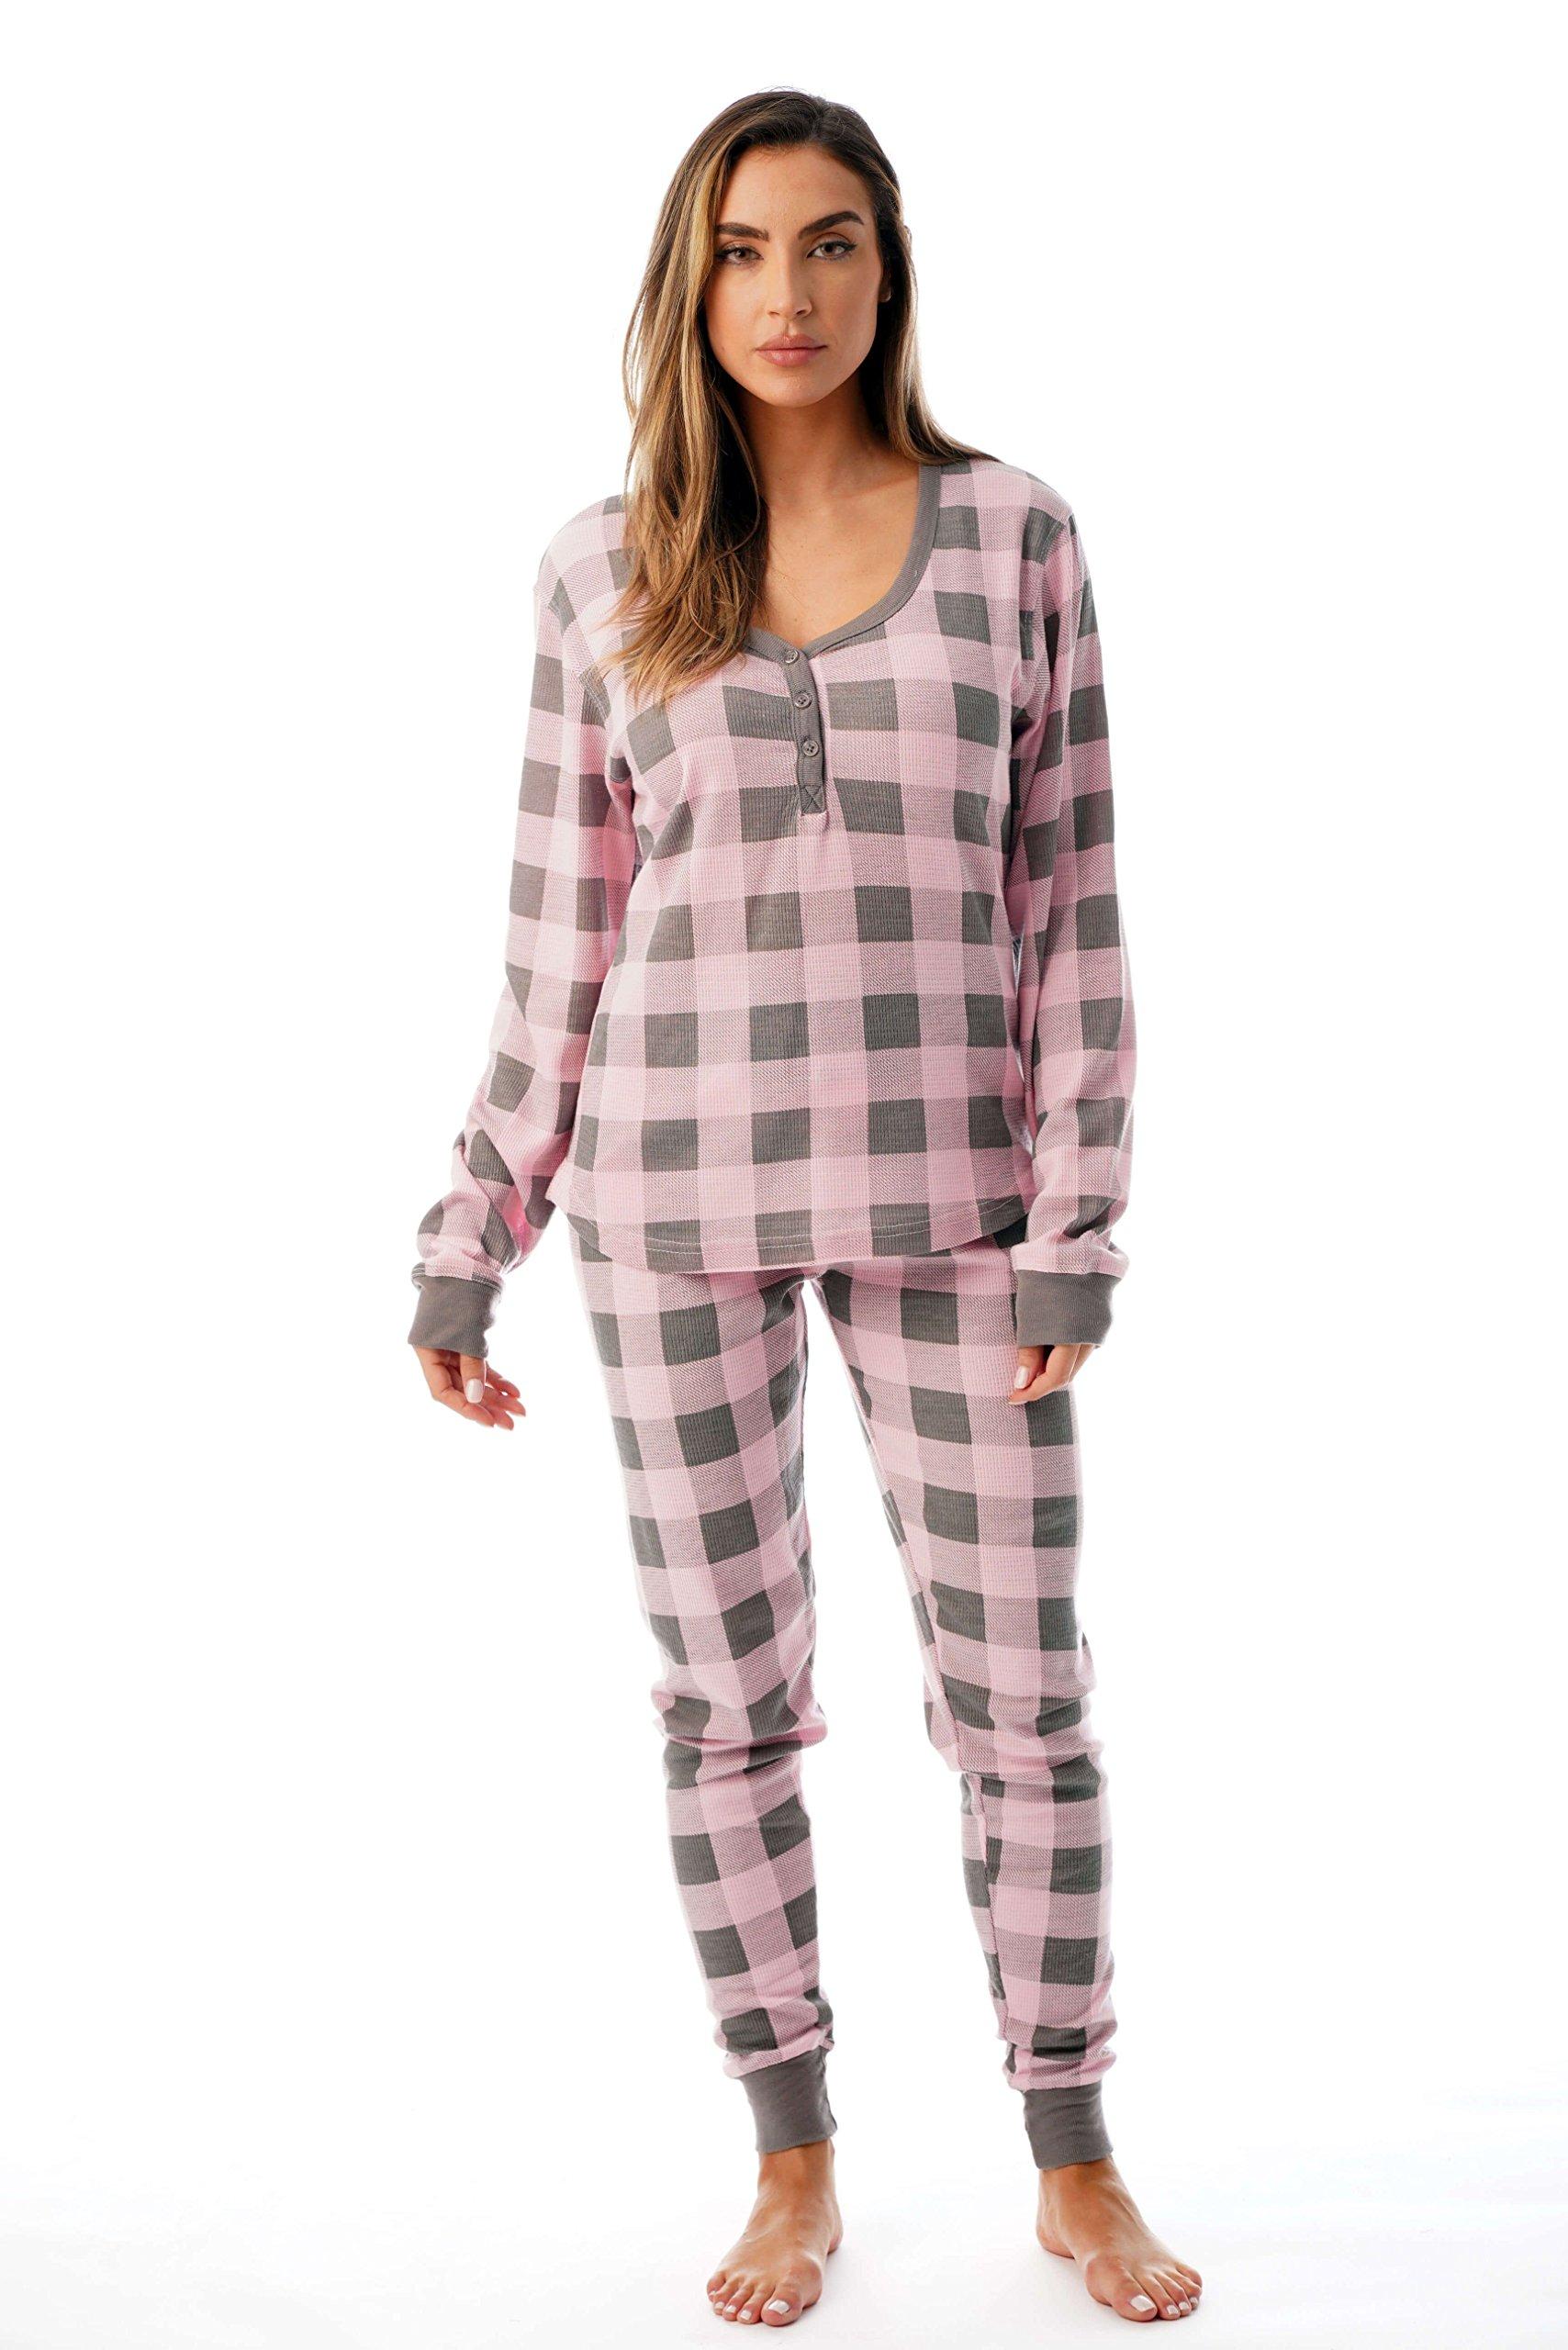 #followme Buffalo Plaid 2 Piece Base Layer Thermal Underwear Set for Women 6372-10195-NEW-PNK-XS by #followme